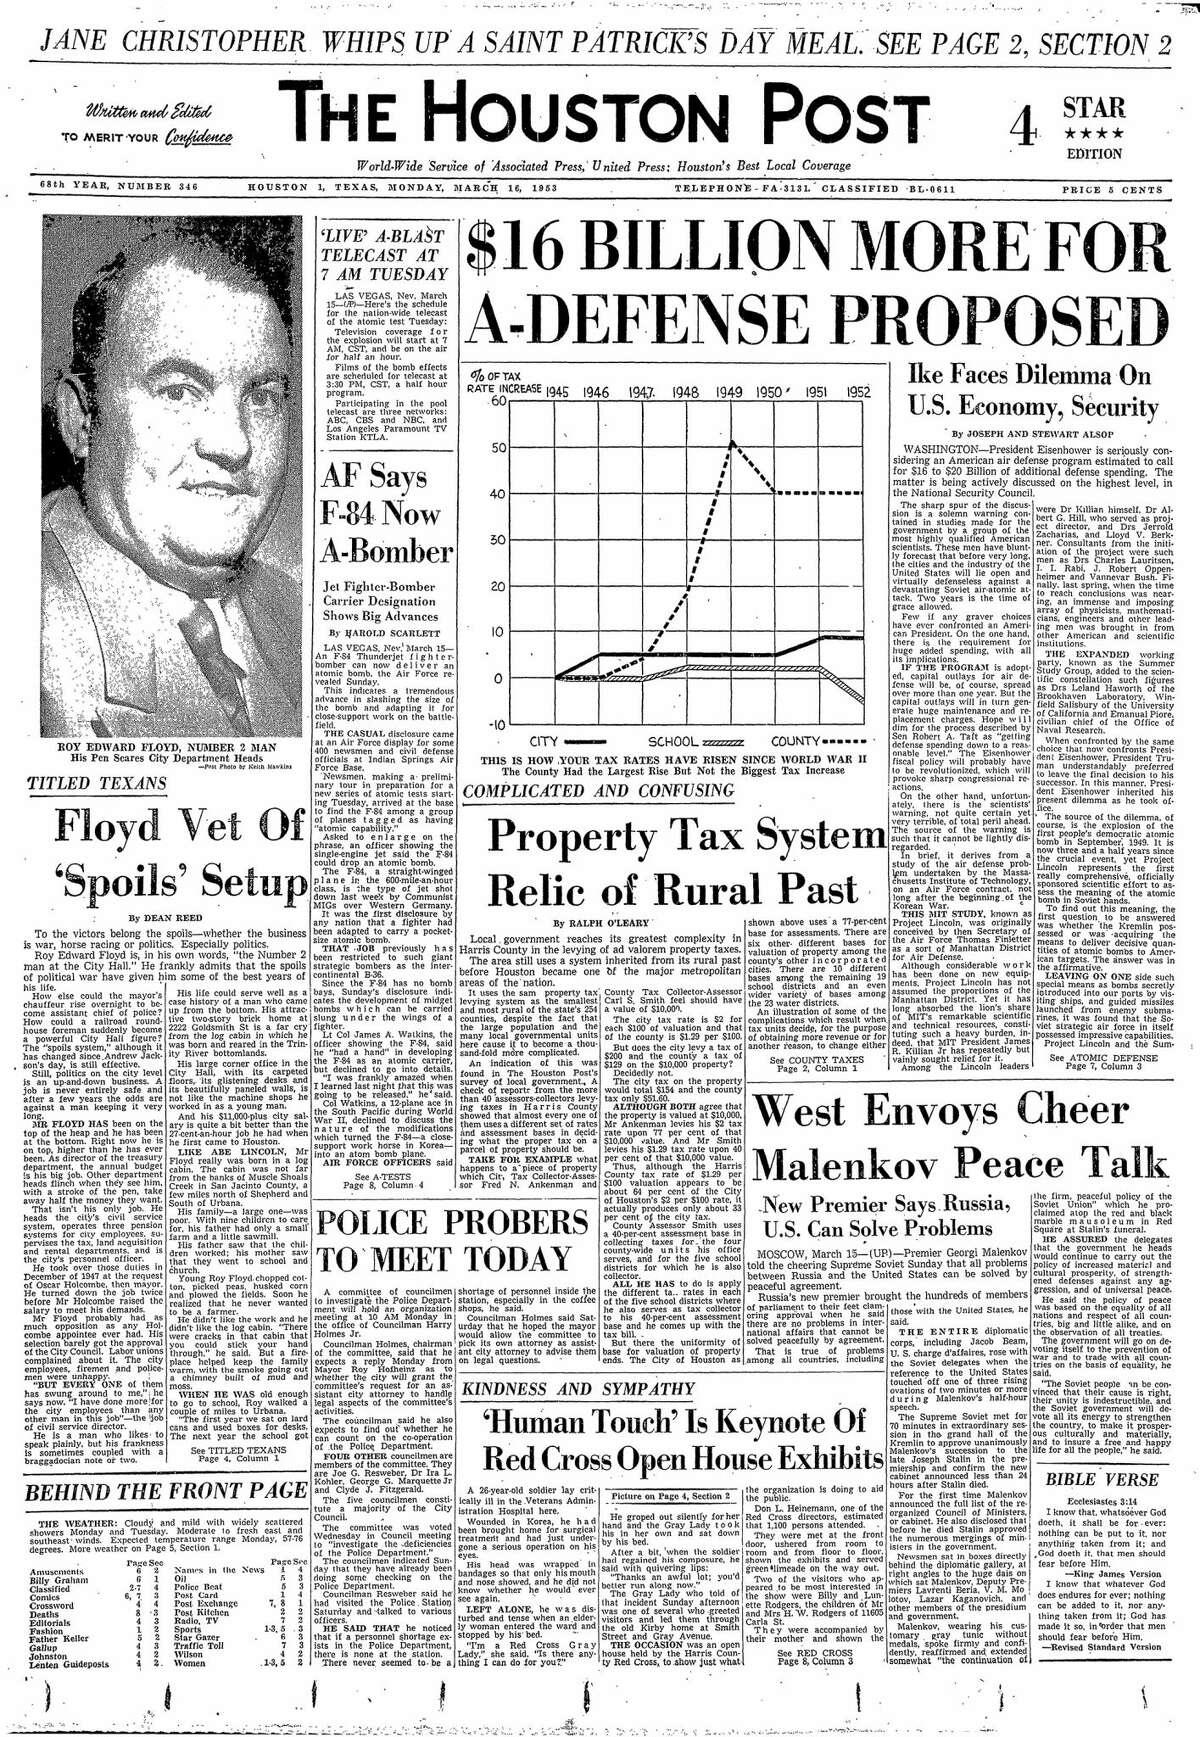 Houston Post, March 16, 1953.